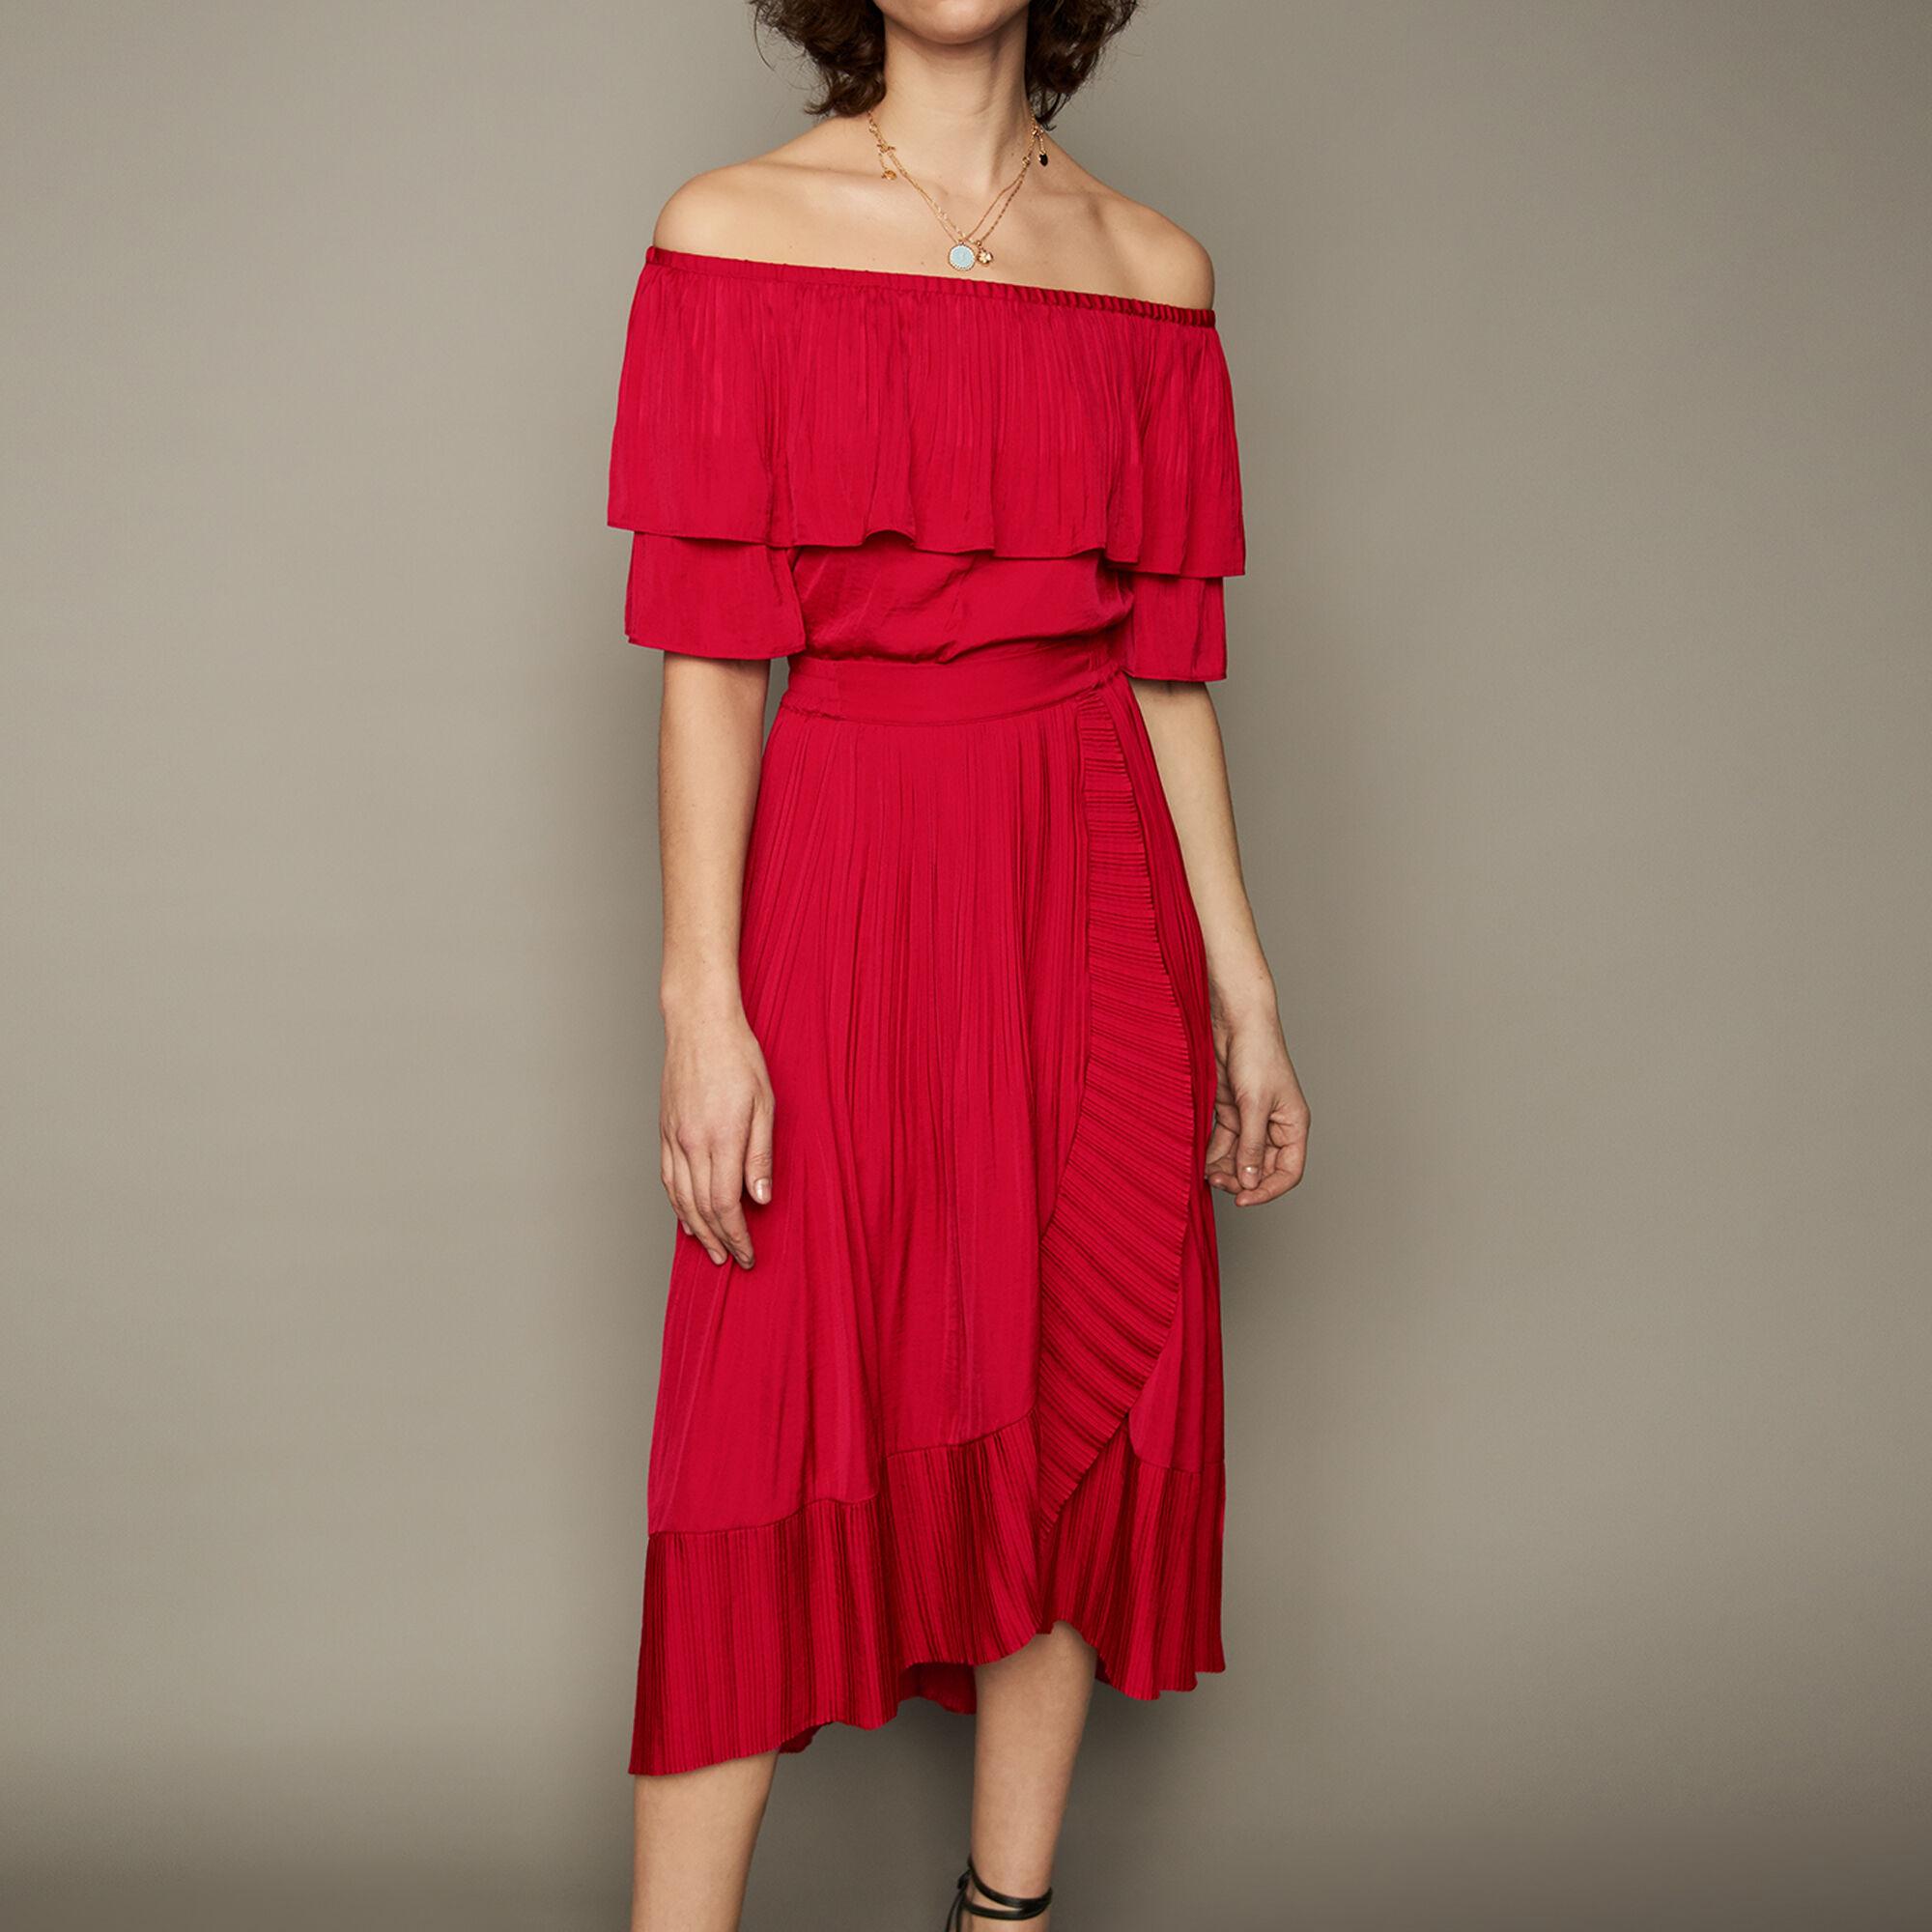 Ma petite robe rouge henin beaumont